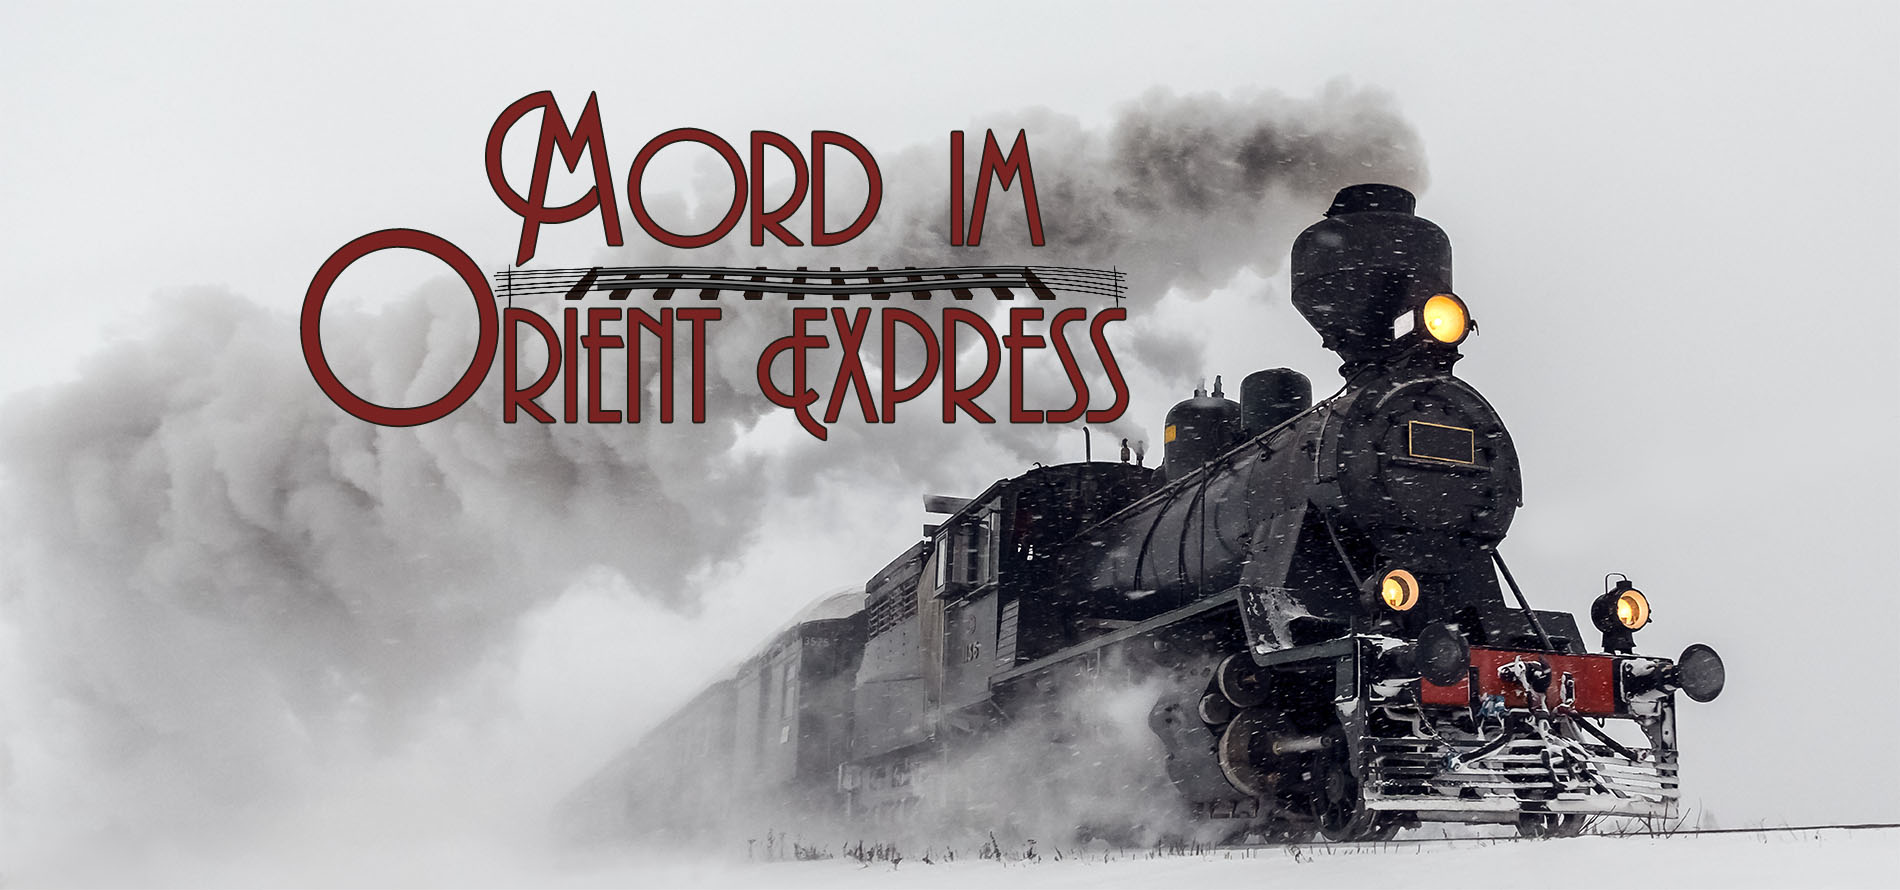 Imdb Mord Im Orientexpress